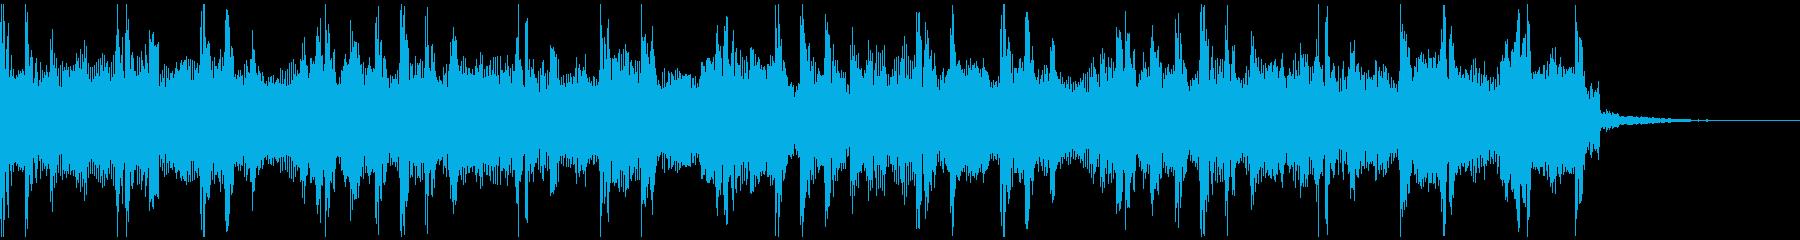 Japanese Chillhop 2の再生済みの波形